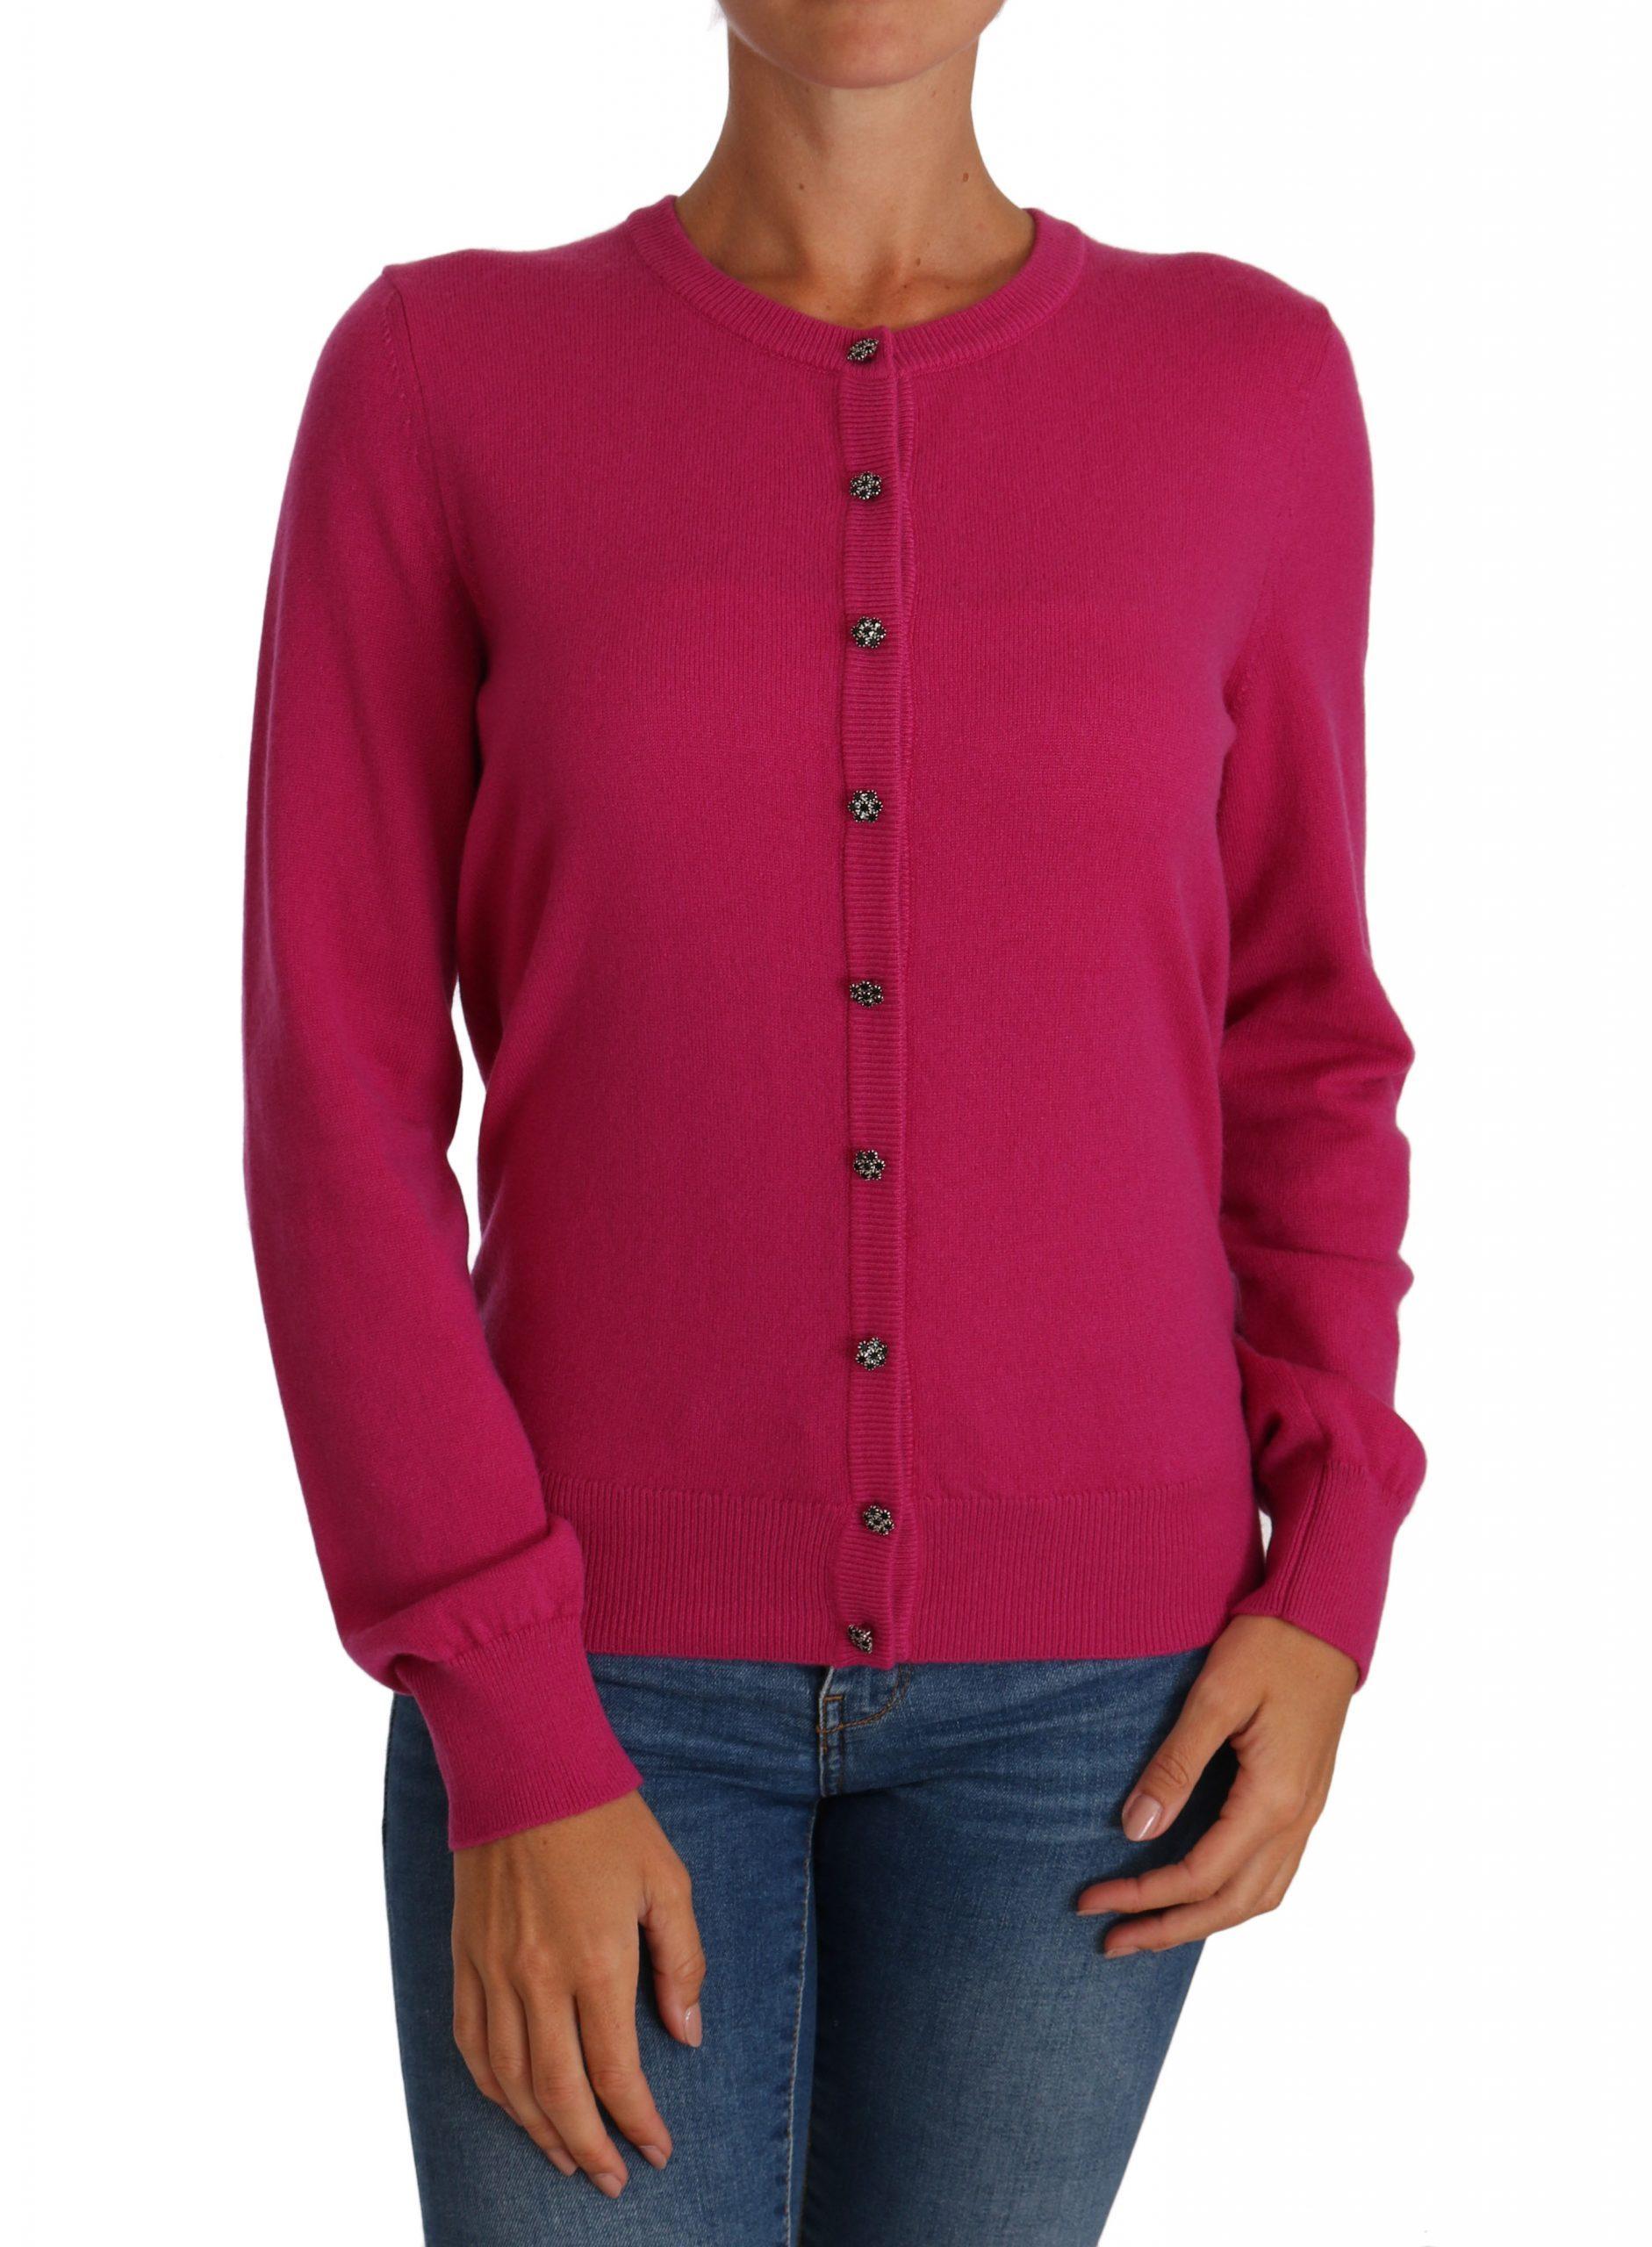 Dolce & Gabbana Women's Cashmere Pink Crystal Button Cardigan Pink PAN60962 - IT44 L